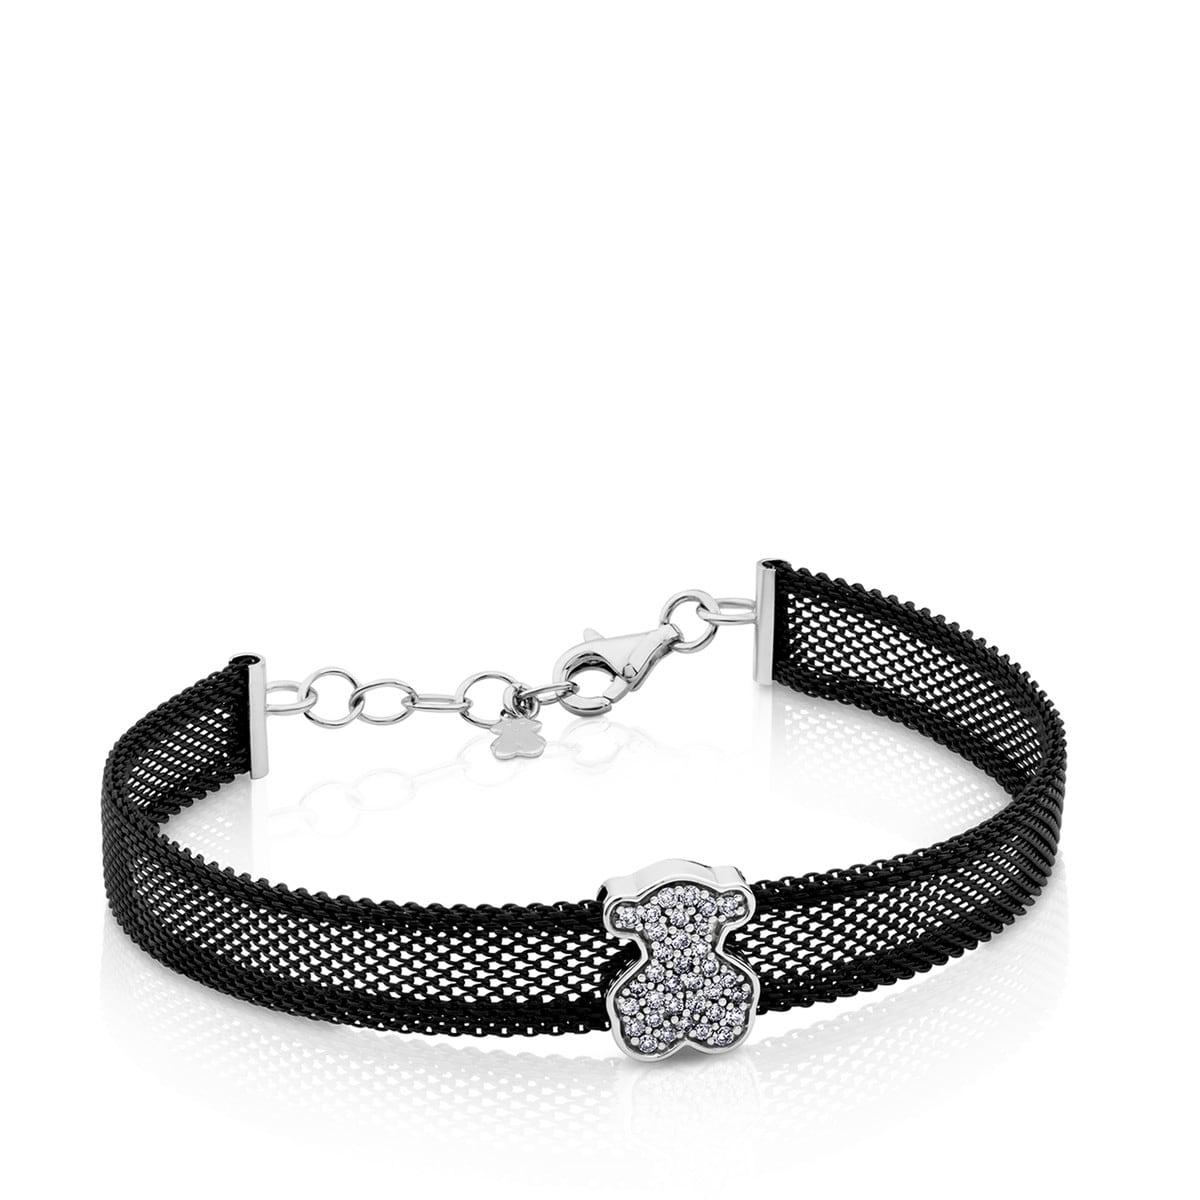 826f8881f76c Pulsera Icon Mesh de Acero y Oro blanco con Diamantes - Tous Site MX